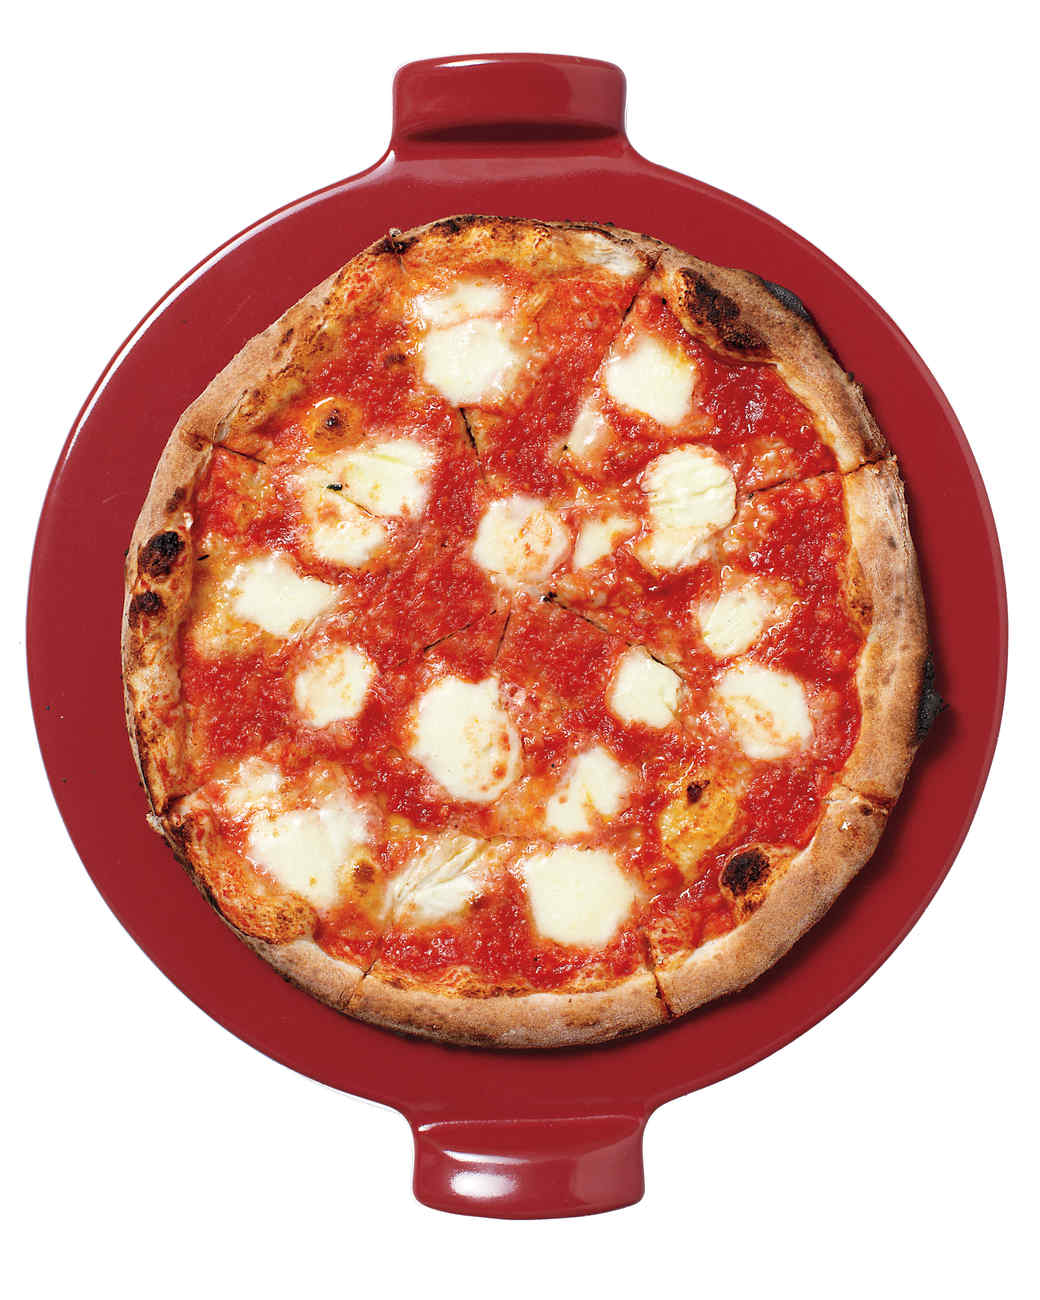 emily-henry-pizza-stone-1-r-mld110379.jpg